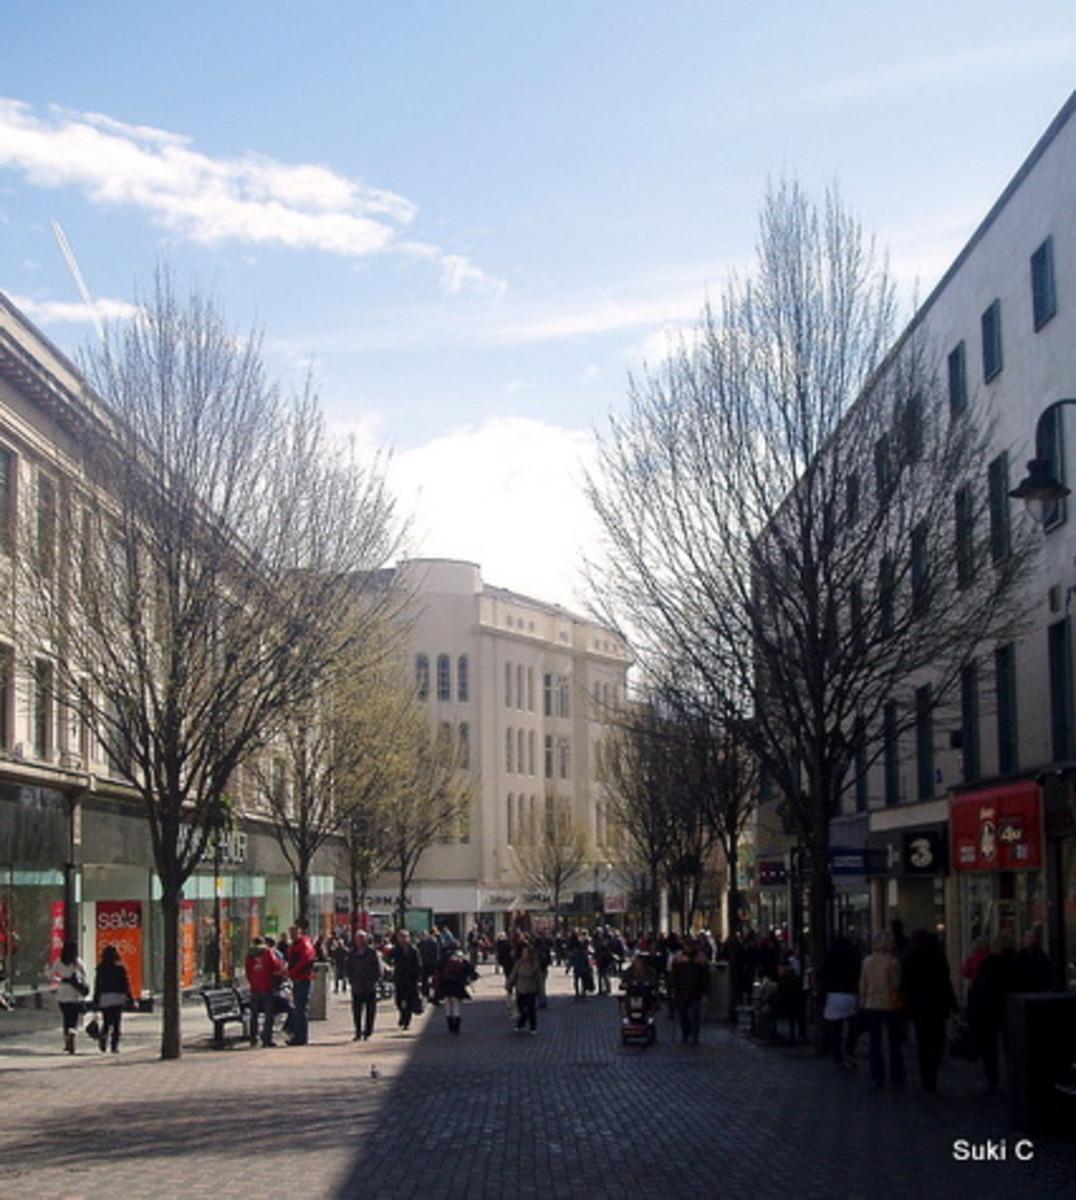 Houndsgate - one of Nottingham's main shopping streets